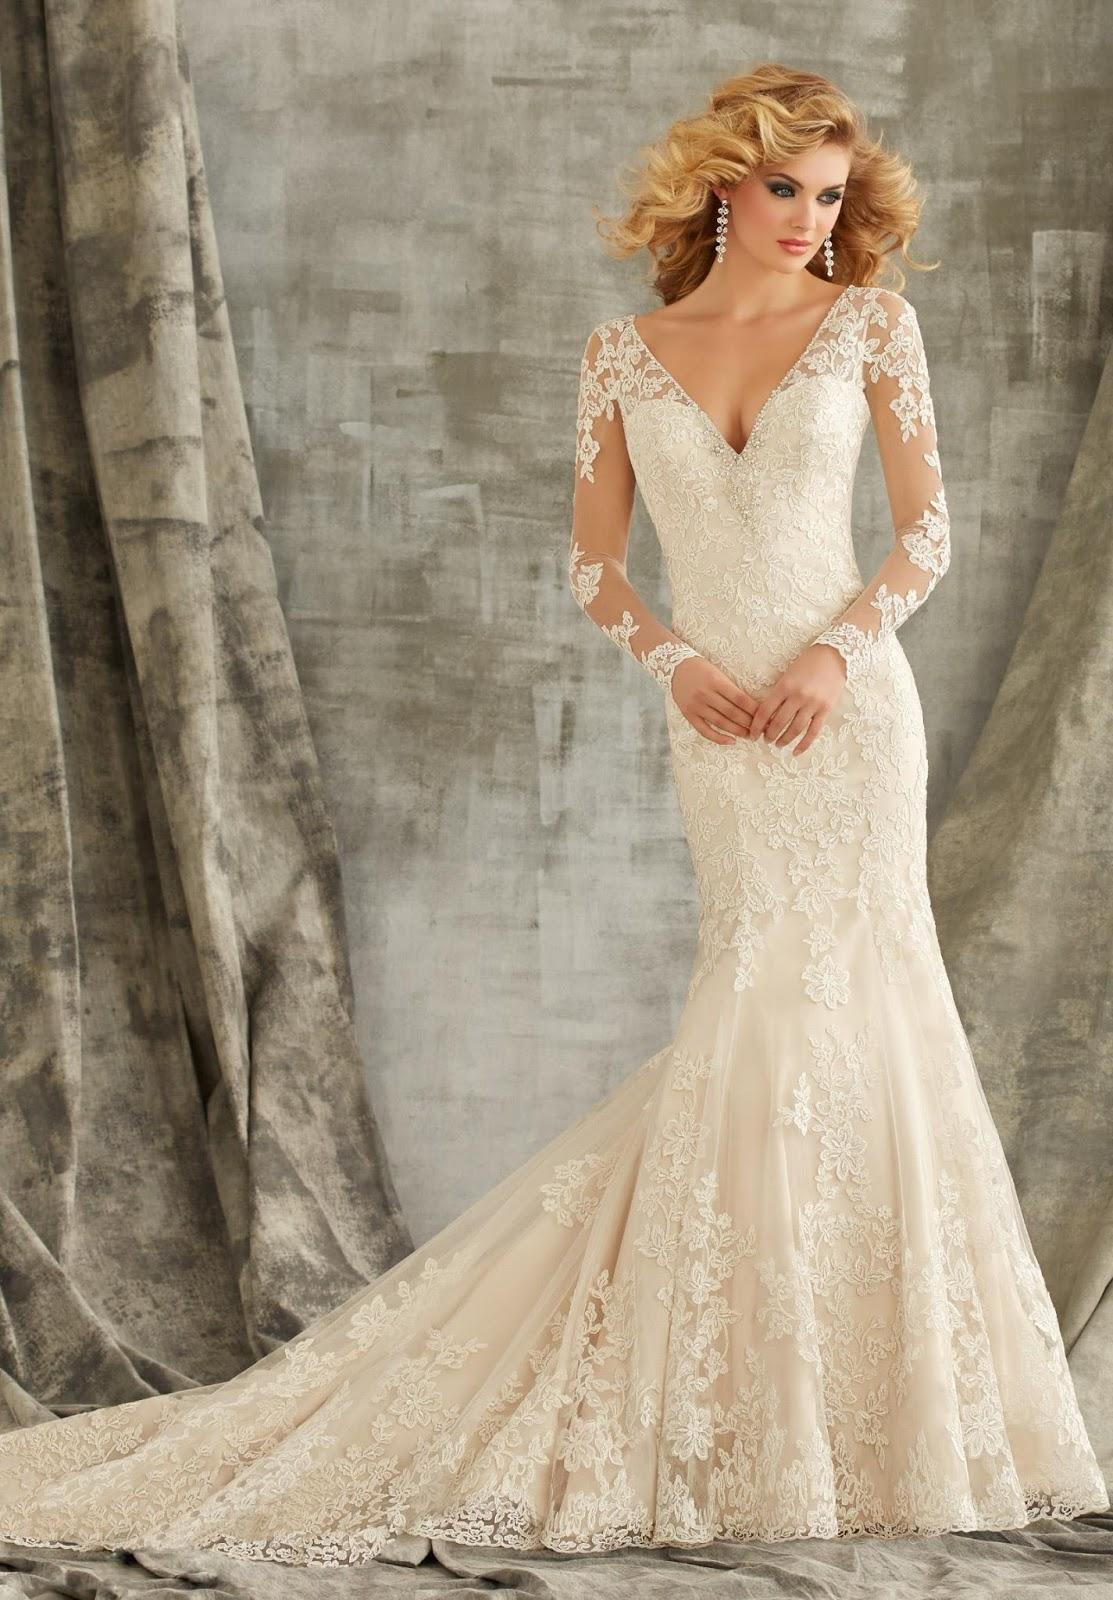 cheap wedding dresses designer wedding dresses maggie sottero wedding dresses online shop designer